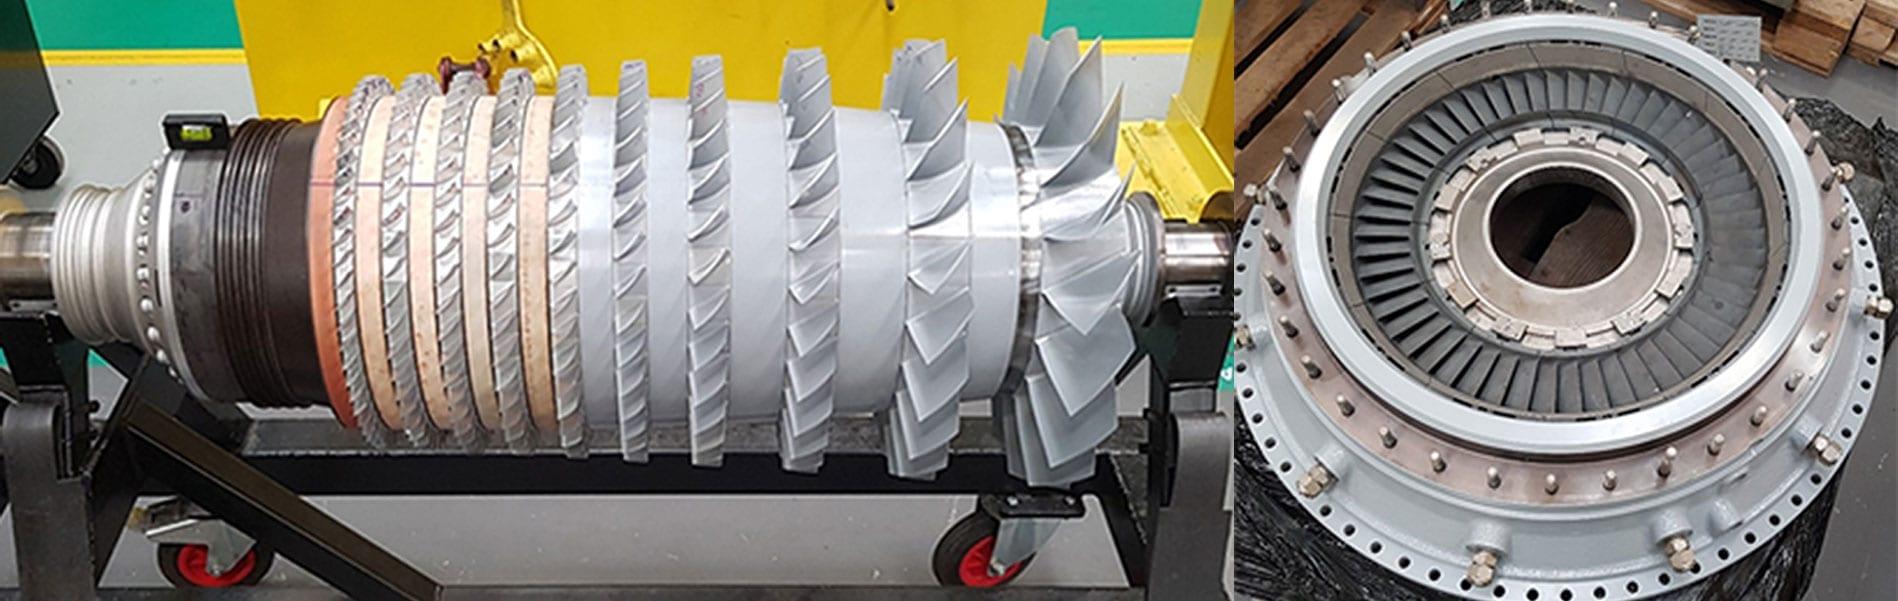 Engine coatings equipment